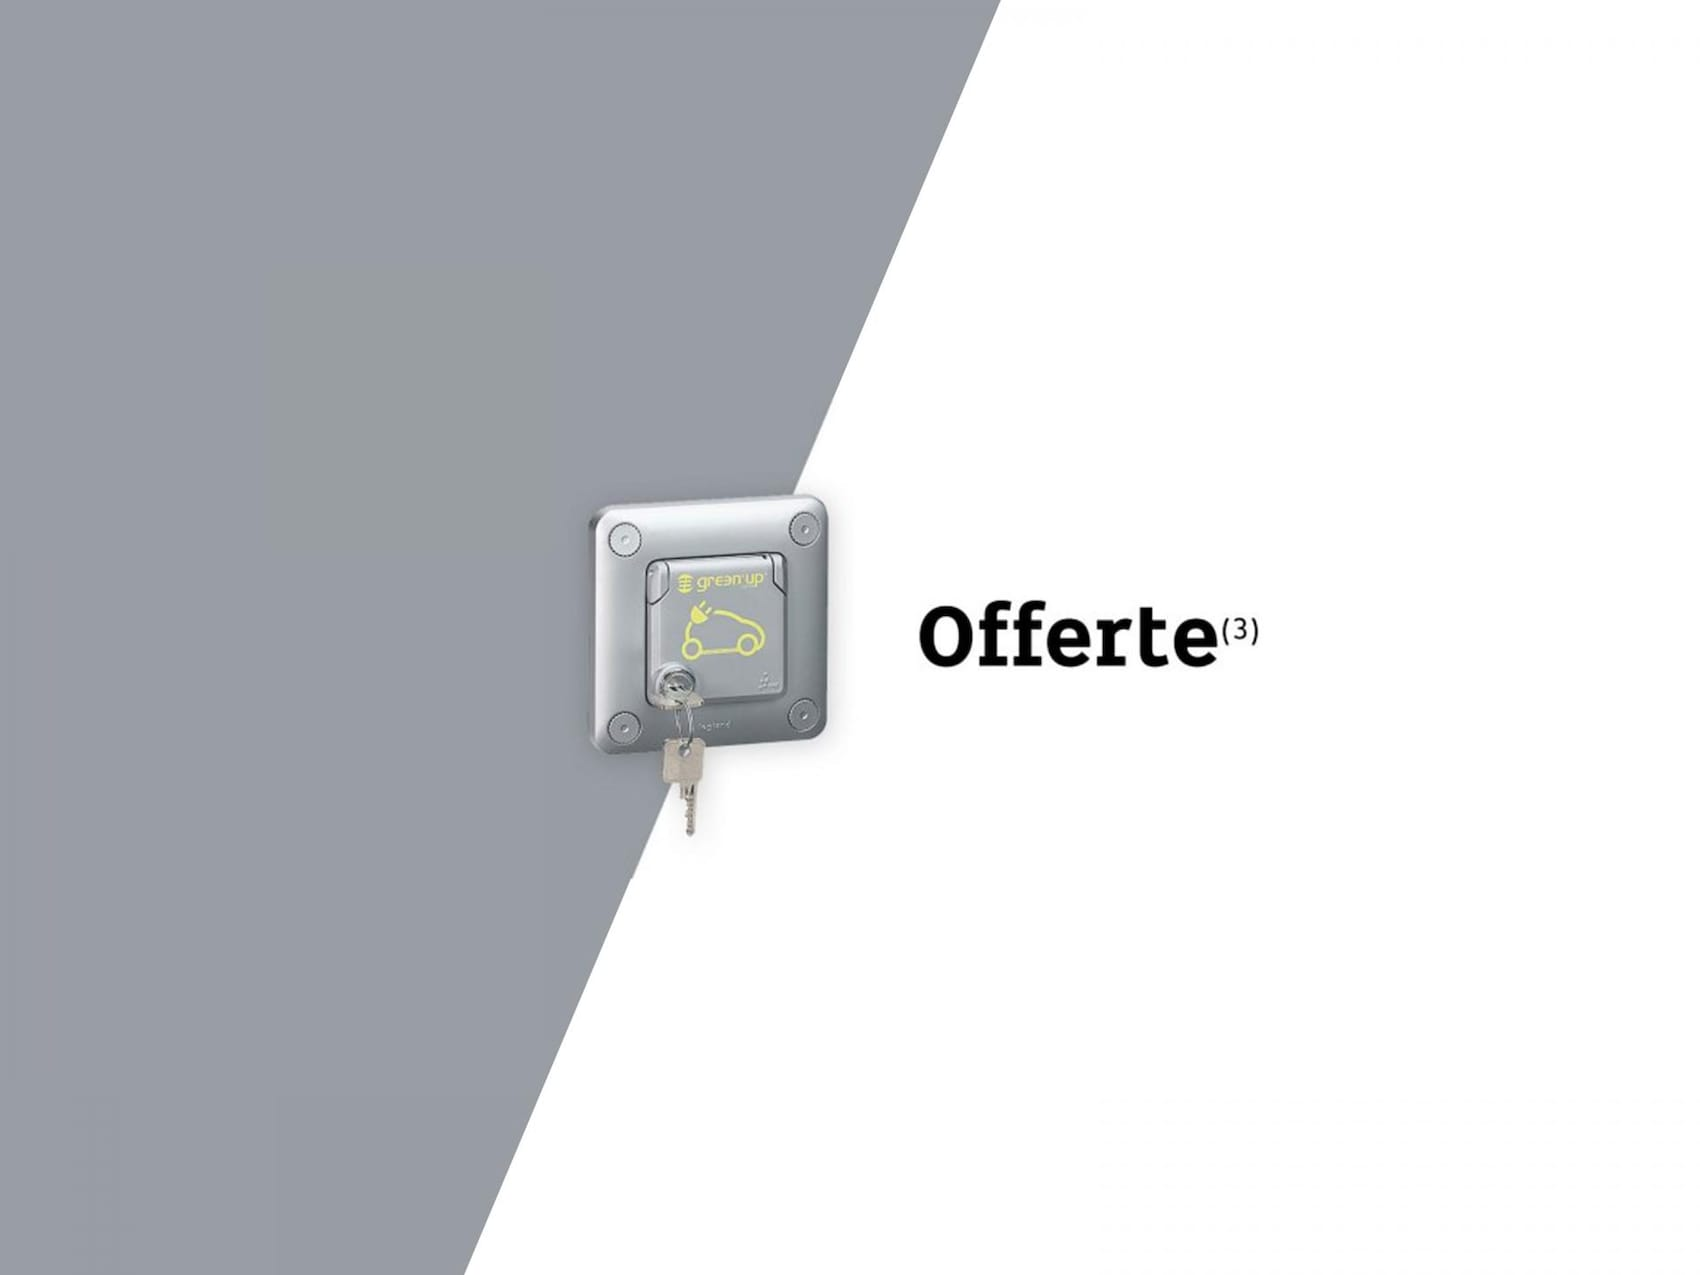 Partenaire_Offre1_Copropriete